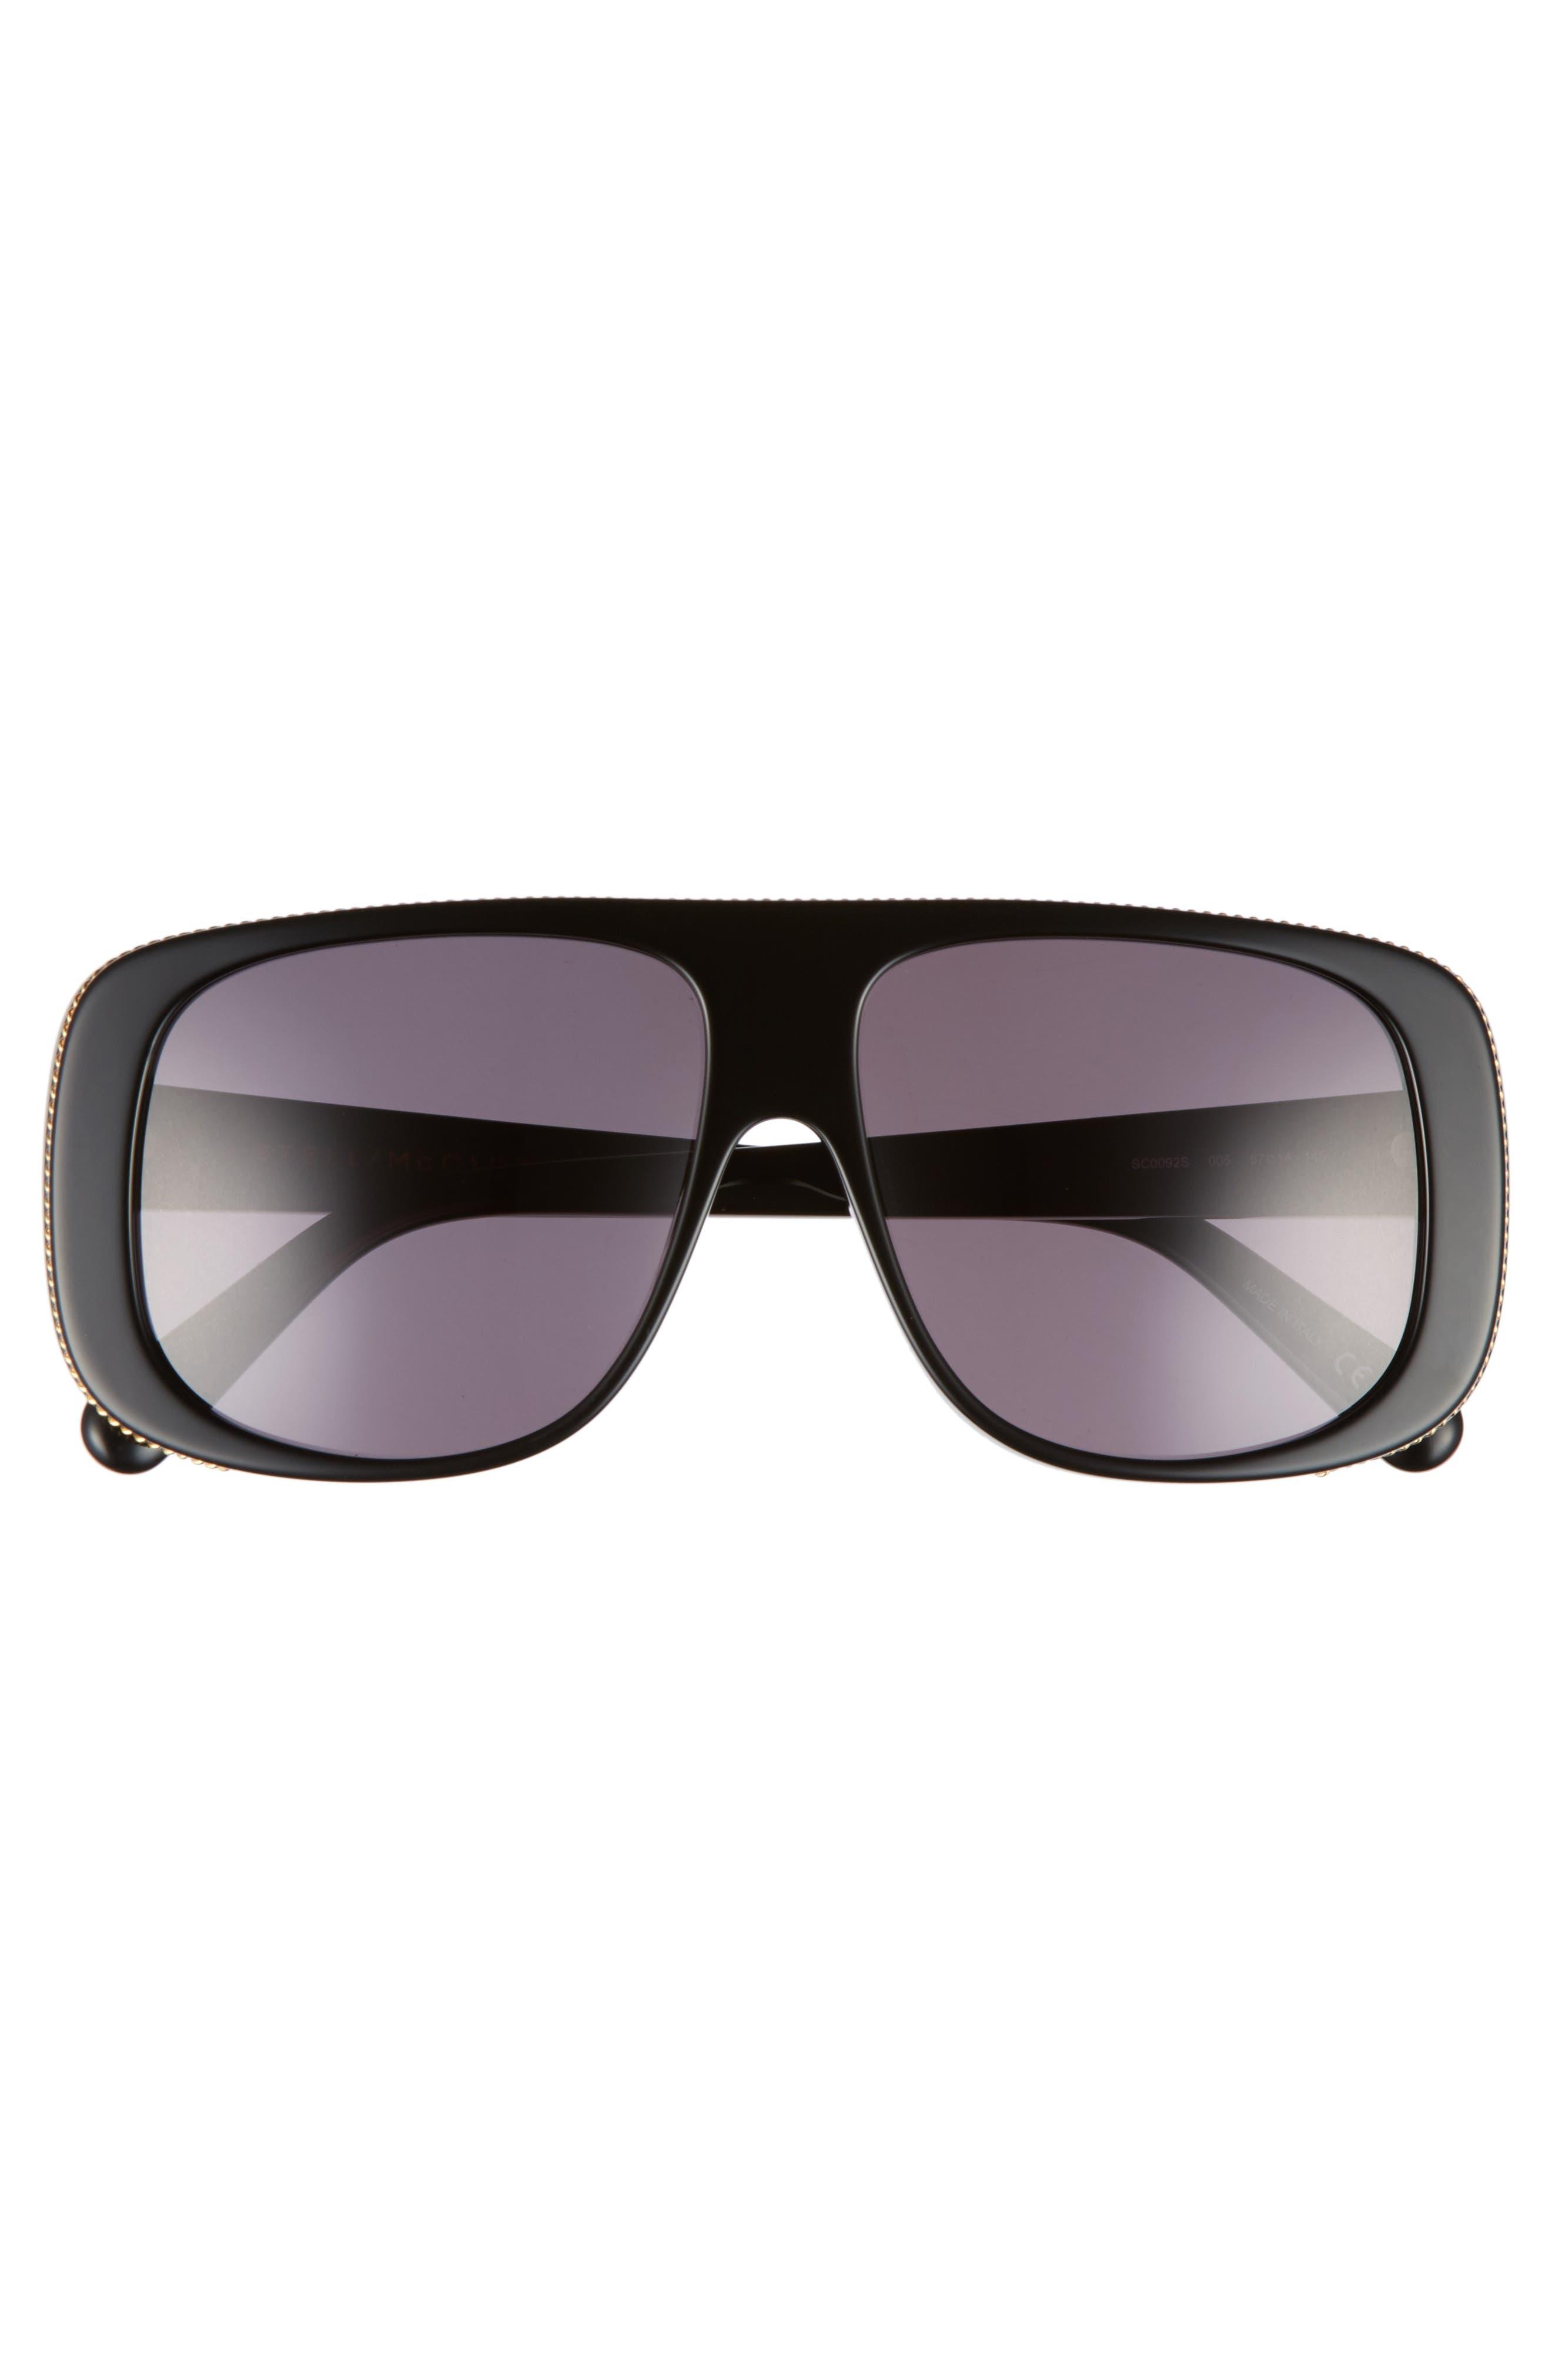 57mm Flat Top Sunglasses,                             Alternate thumbnail 3, color,                             BLACK/ GREY